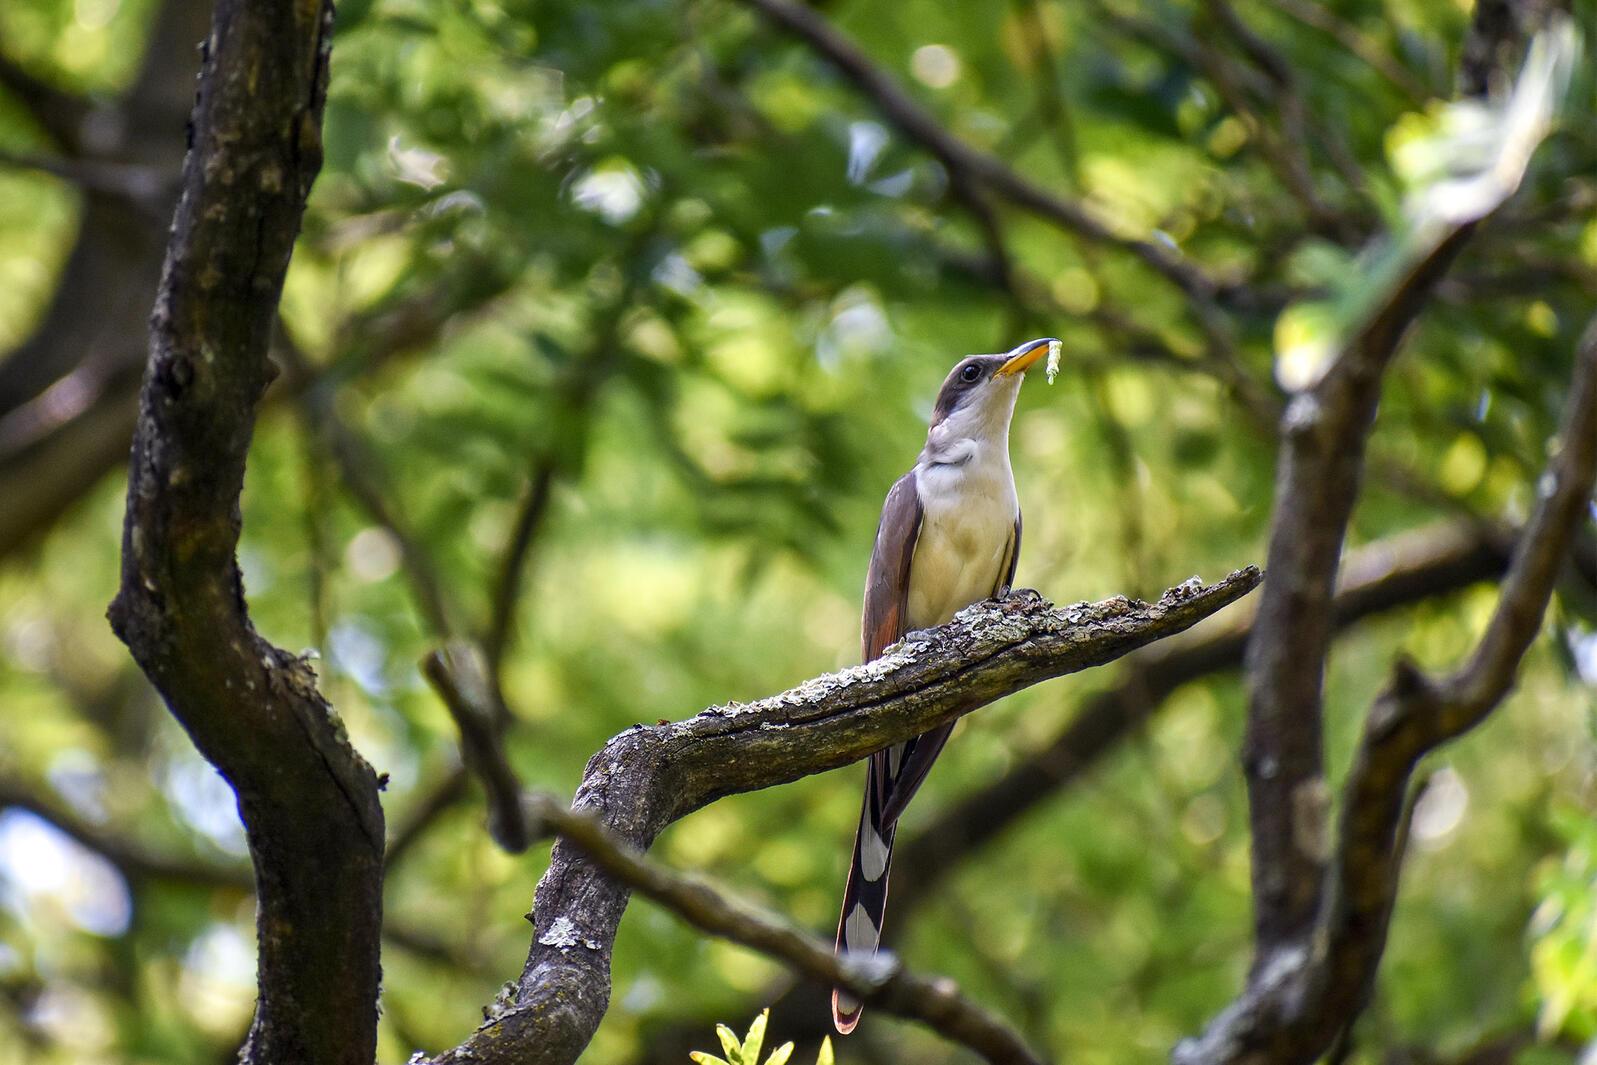 Yellow-billed Cuckoo. Johnny Stutzman/Audubon Photography Awards